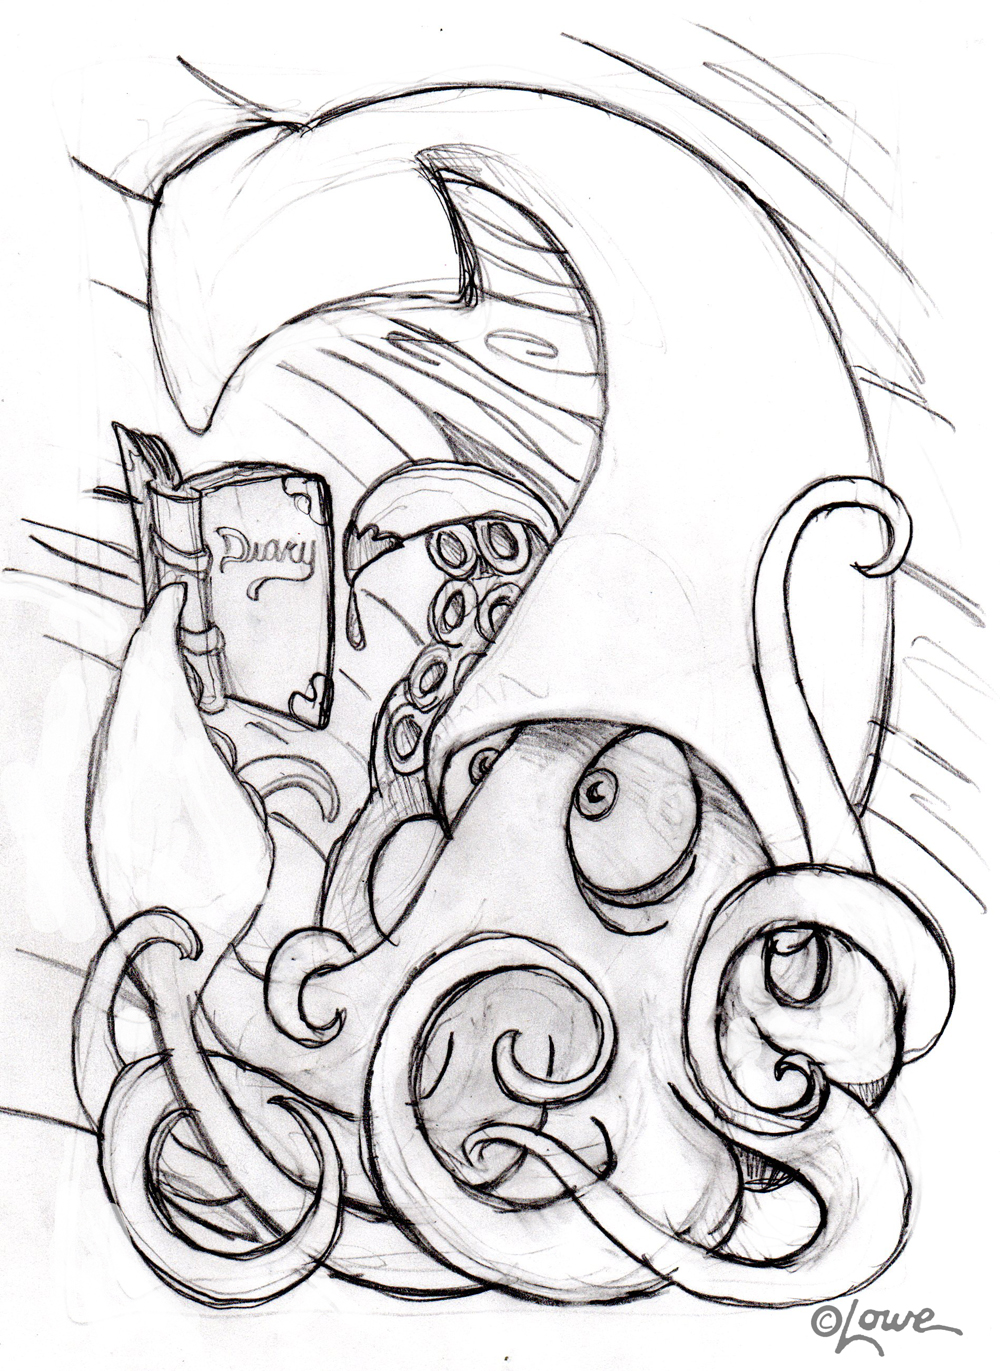 1000x1371 DAVE LOWE DESIGN the Blog Eddie Izzard#39s Giant Squid